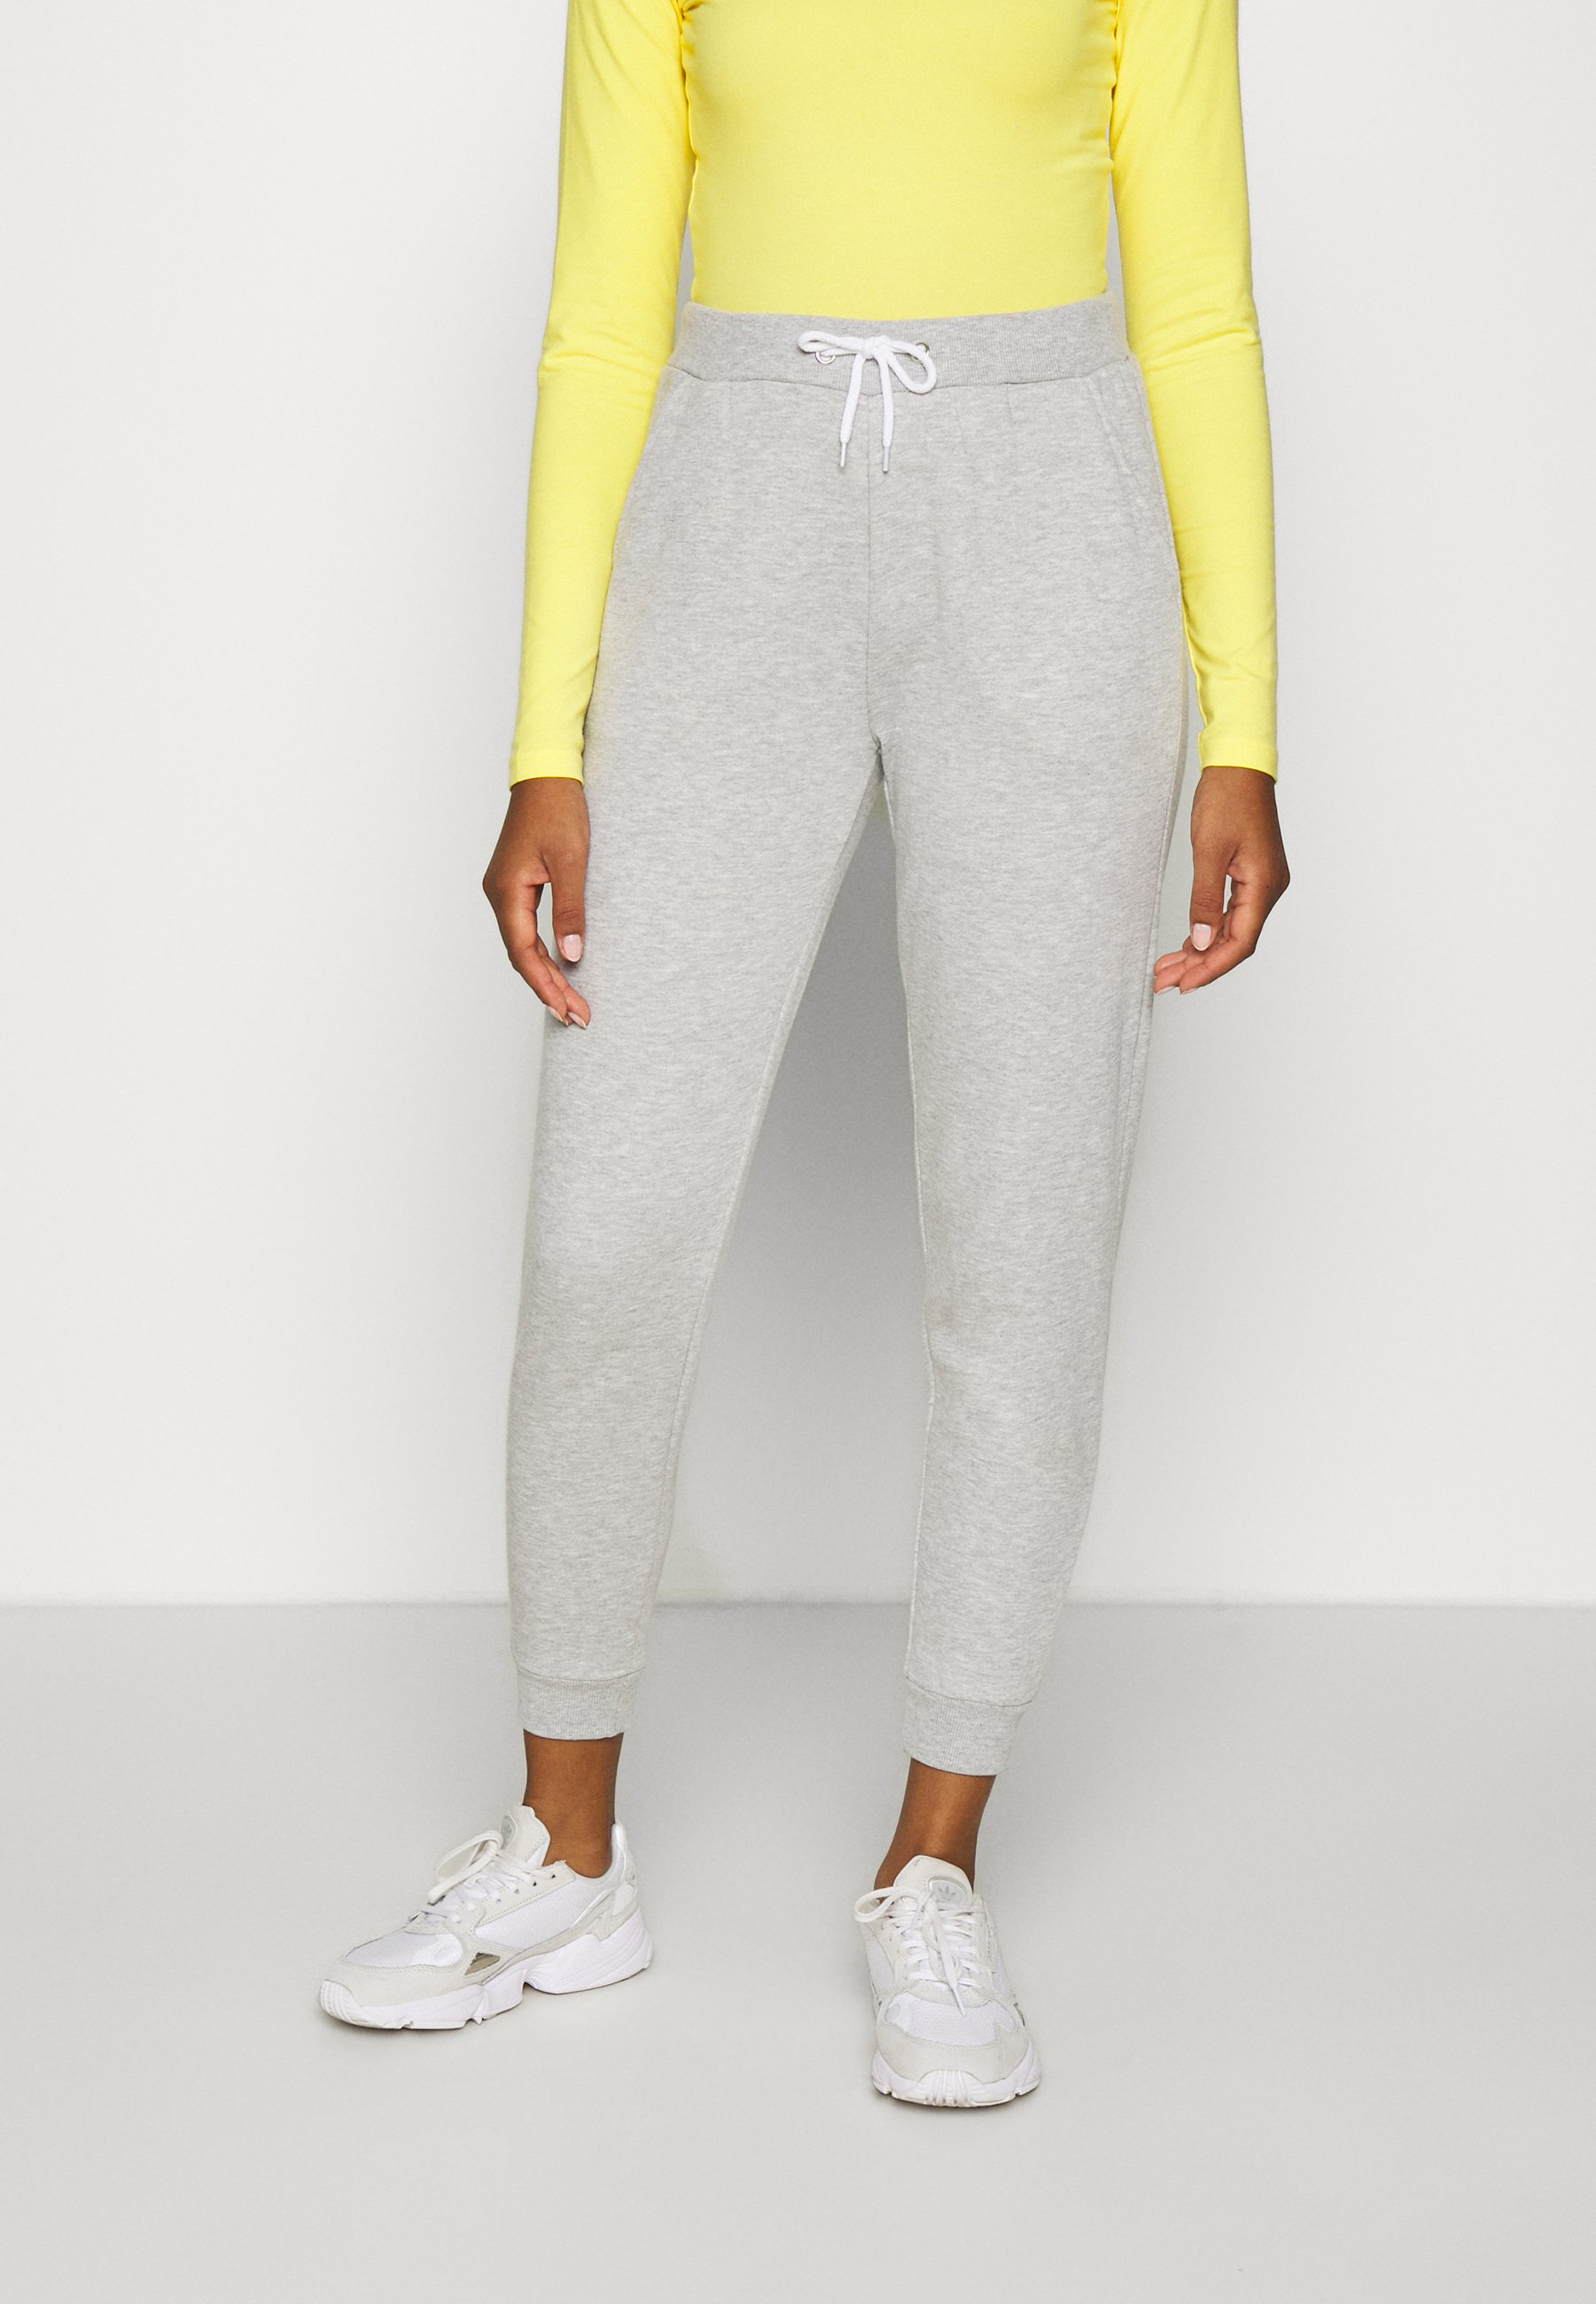 Damen Regular fit jogger with contrast - Jogginghose